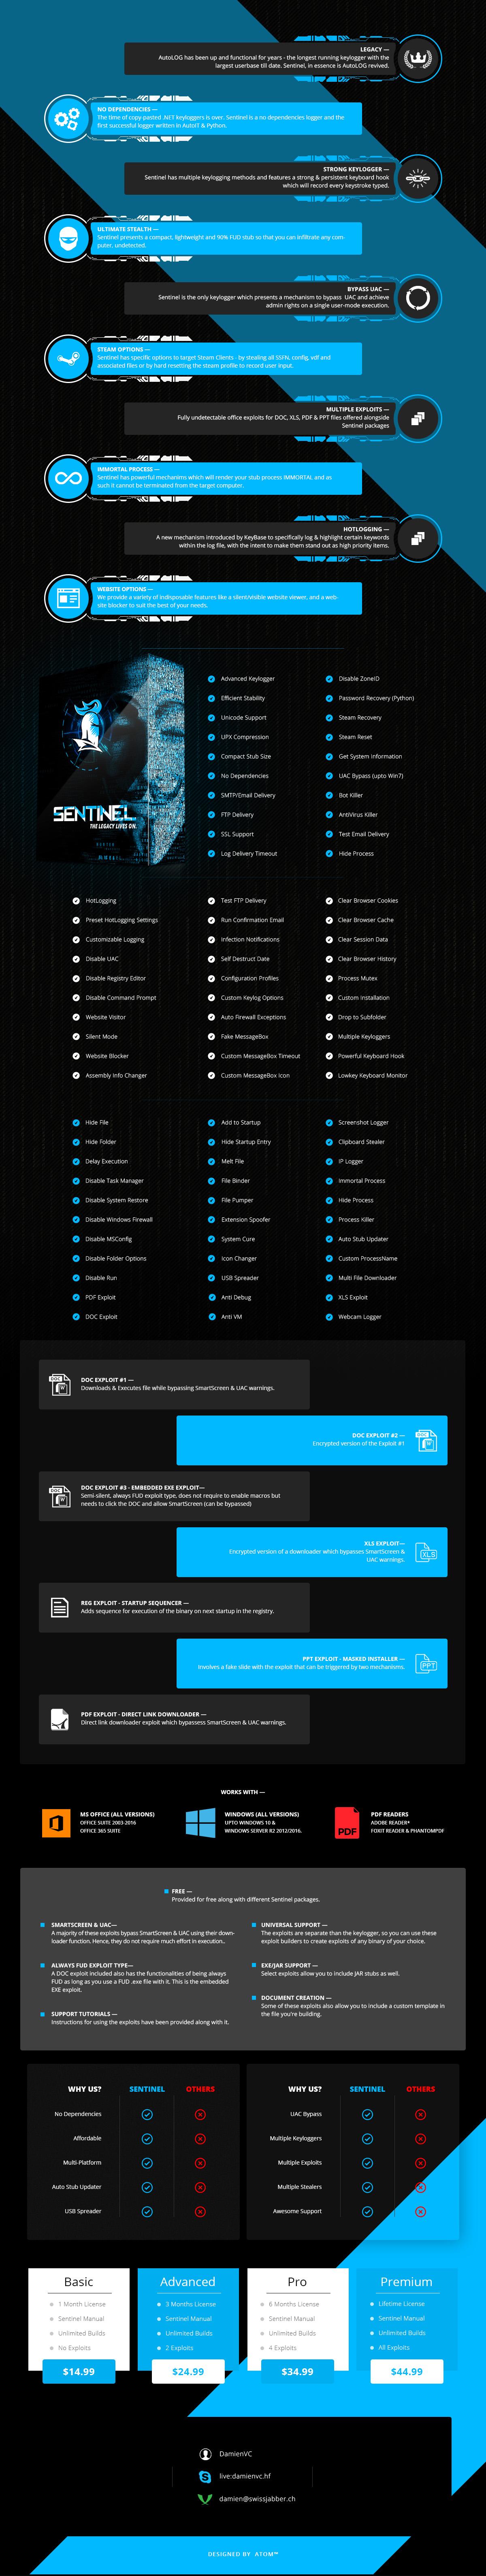 Keylogger windows 8 linux